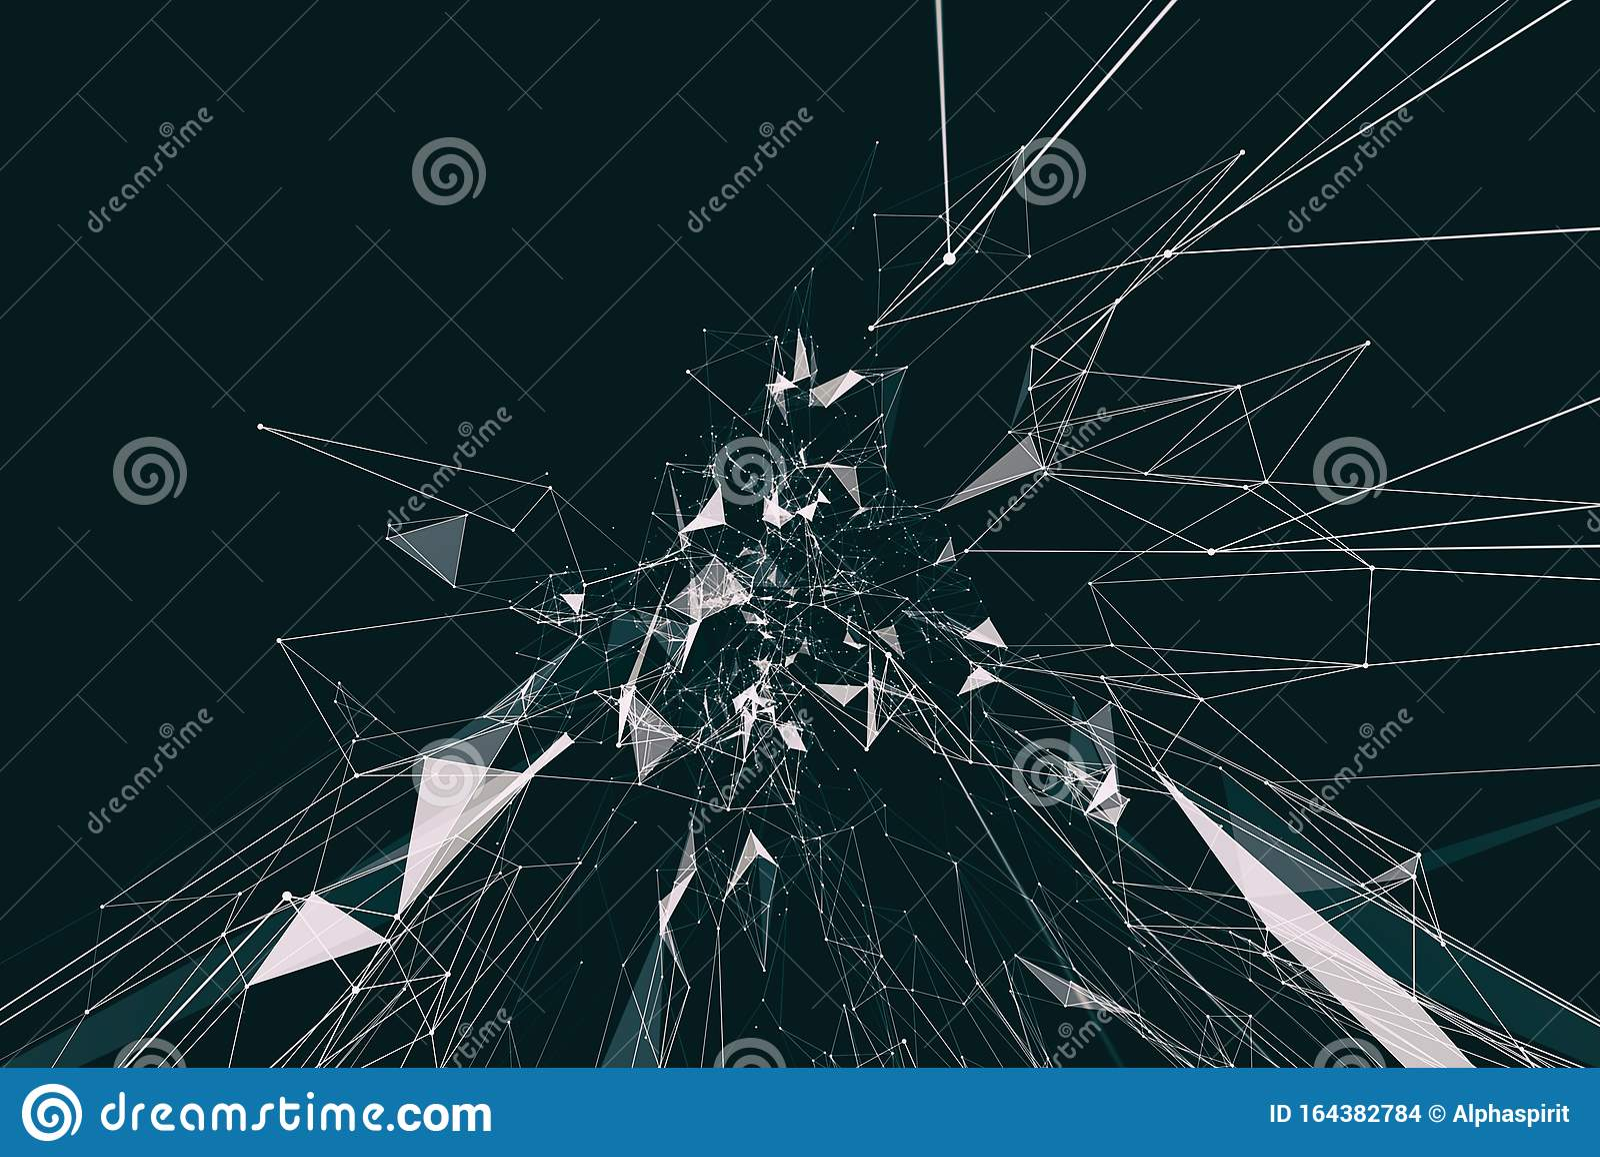 Modern futuristic network design. Internet connection concept